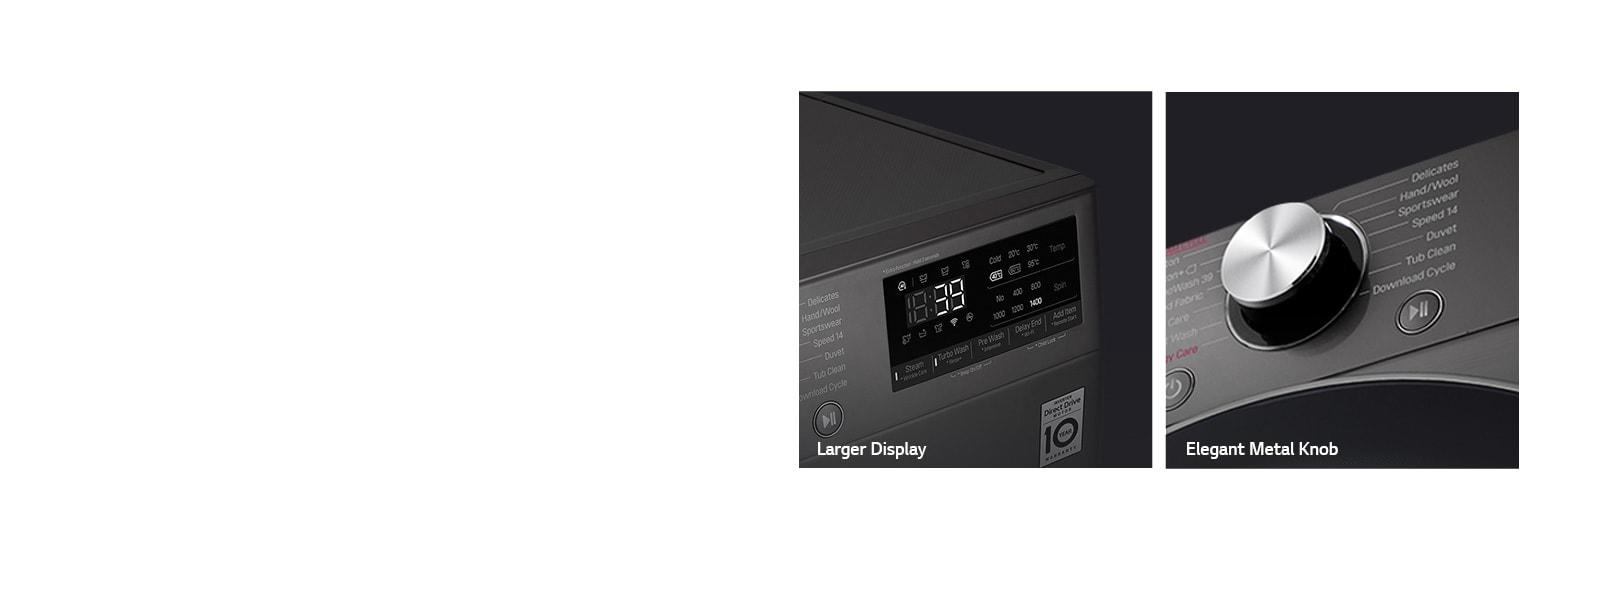 LG F4V9BWP2E 12 kg More Visible and Elegant